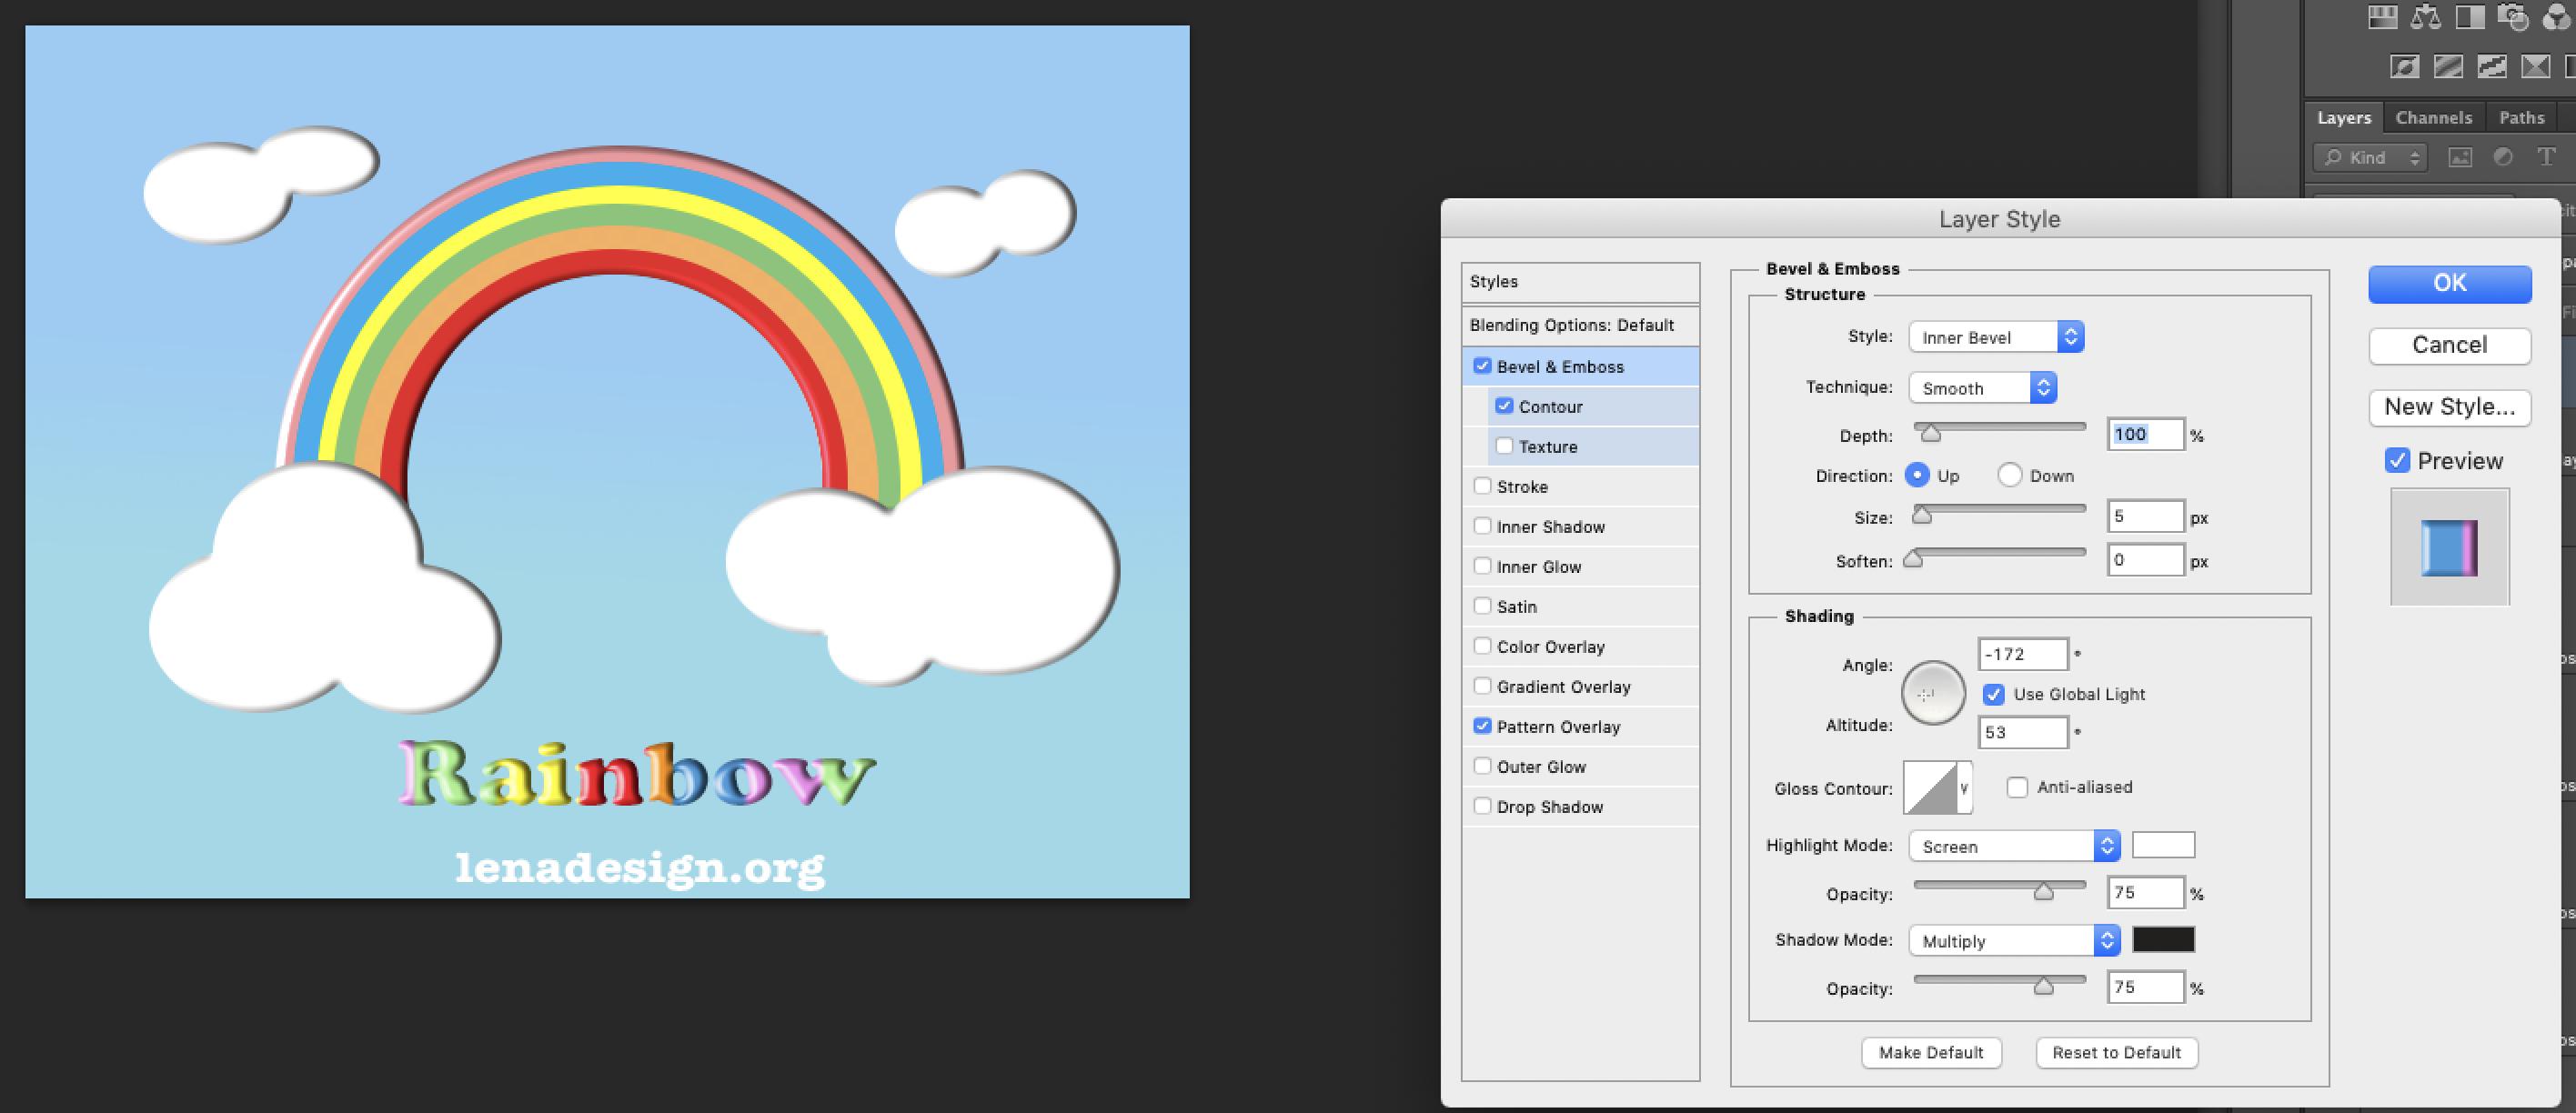 Rainbow Text Photoshop